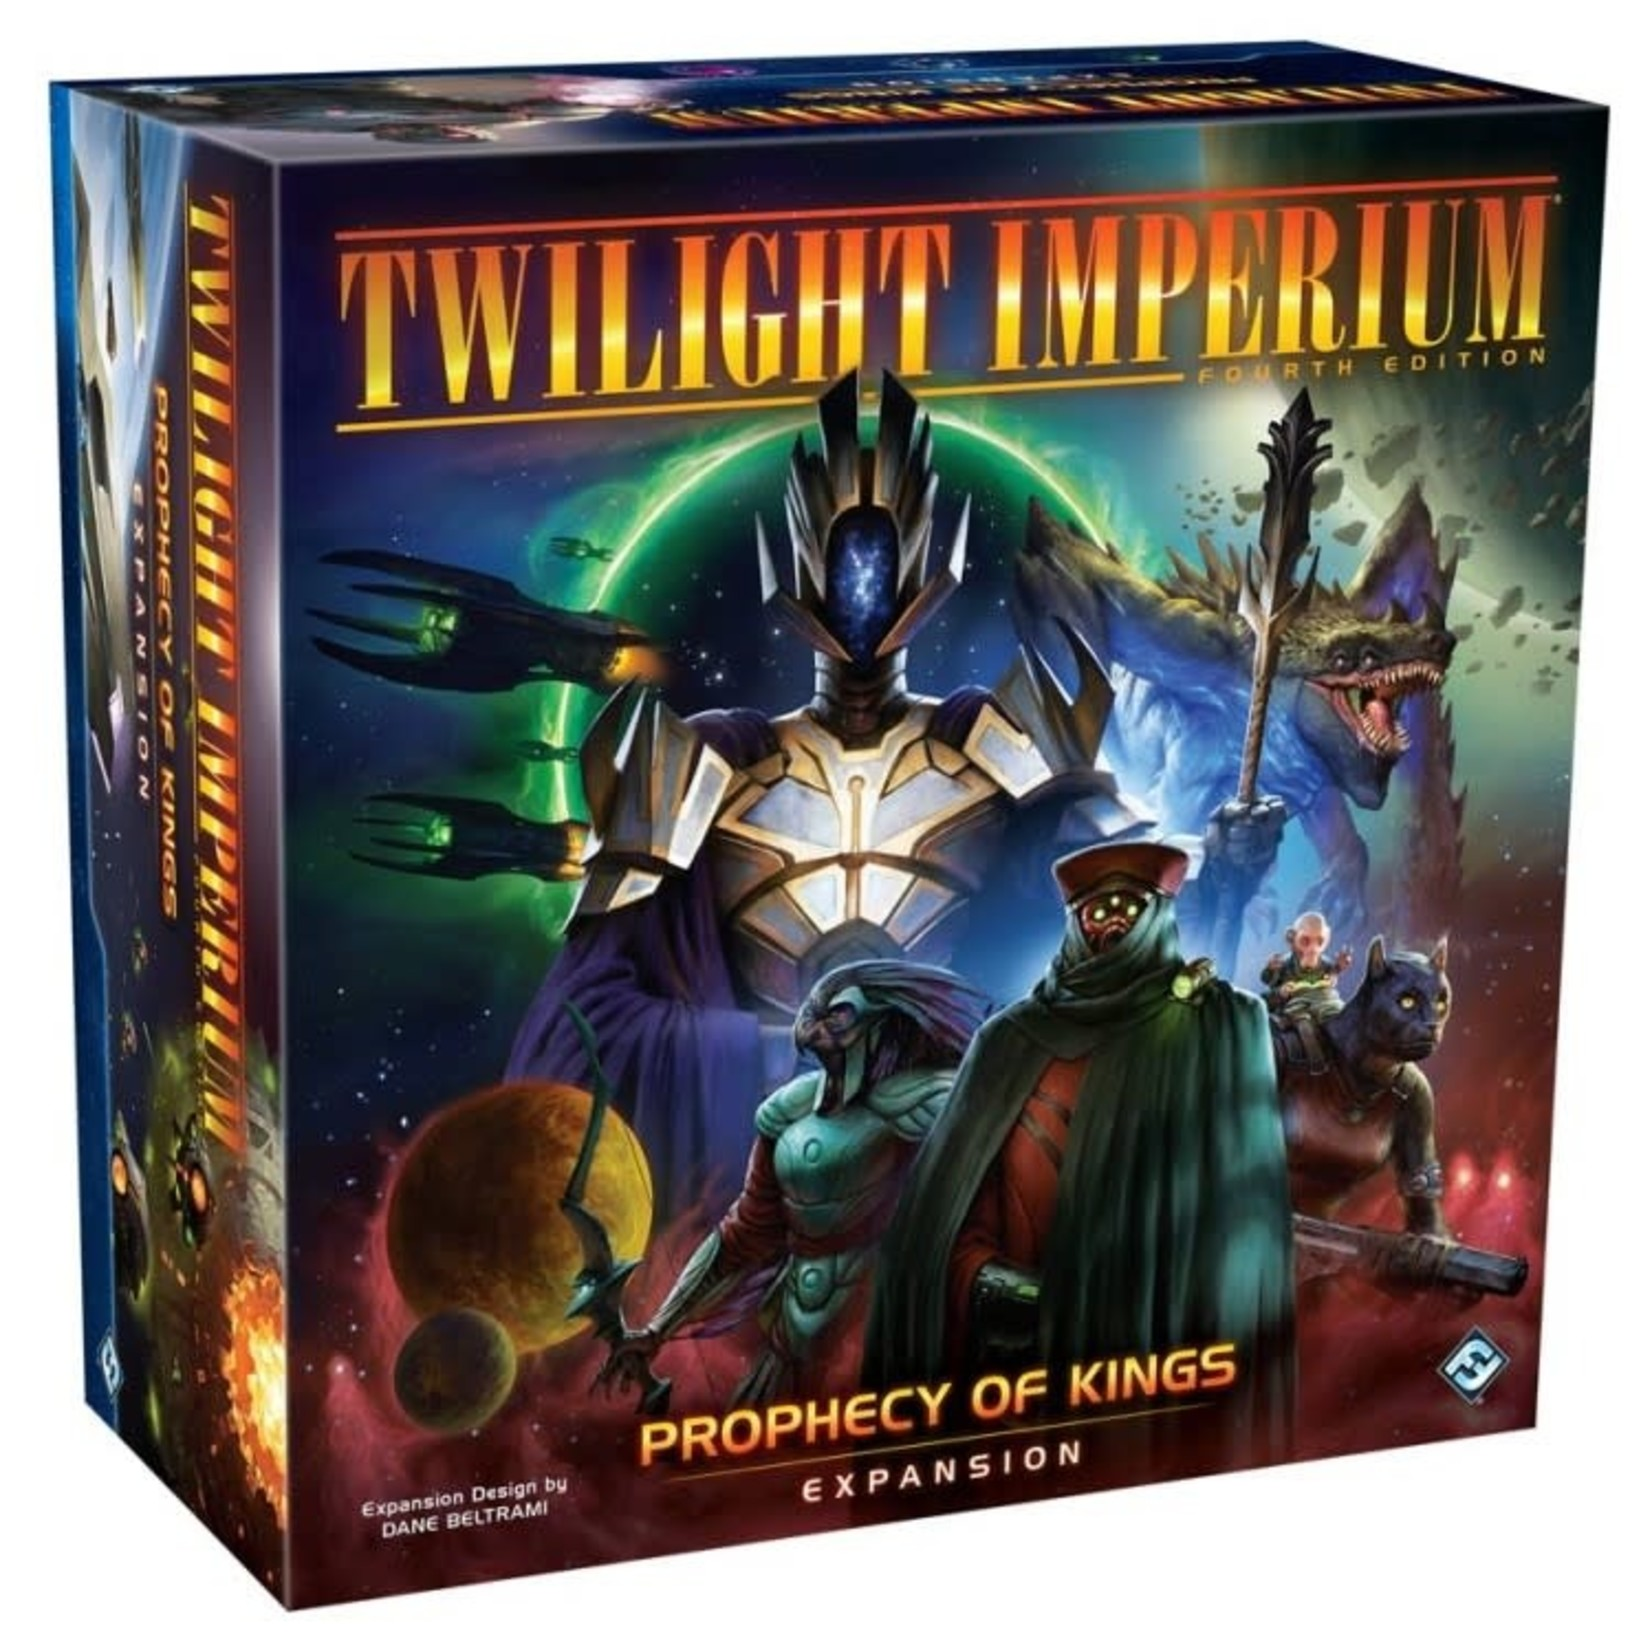 Fantasy Flight Games Twilight Imperium: Prophecy of Kings